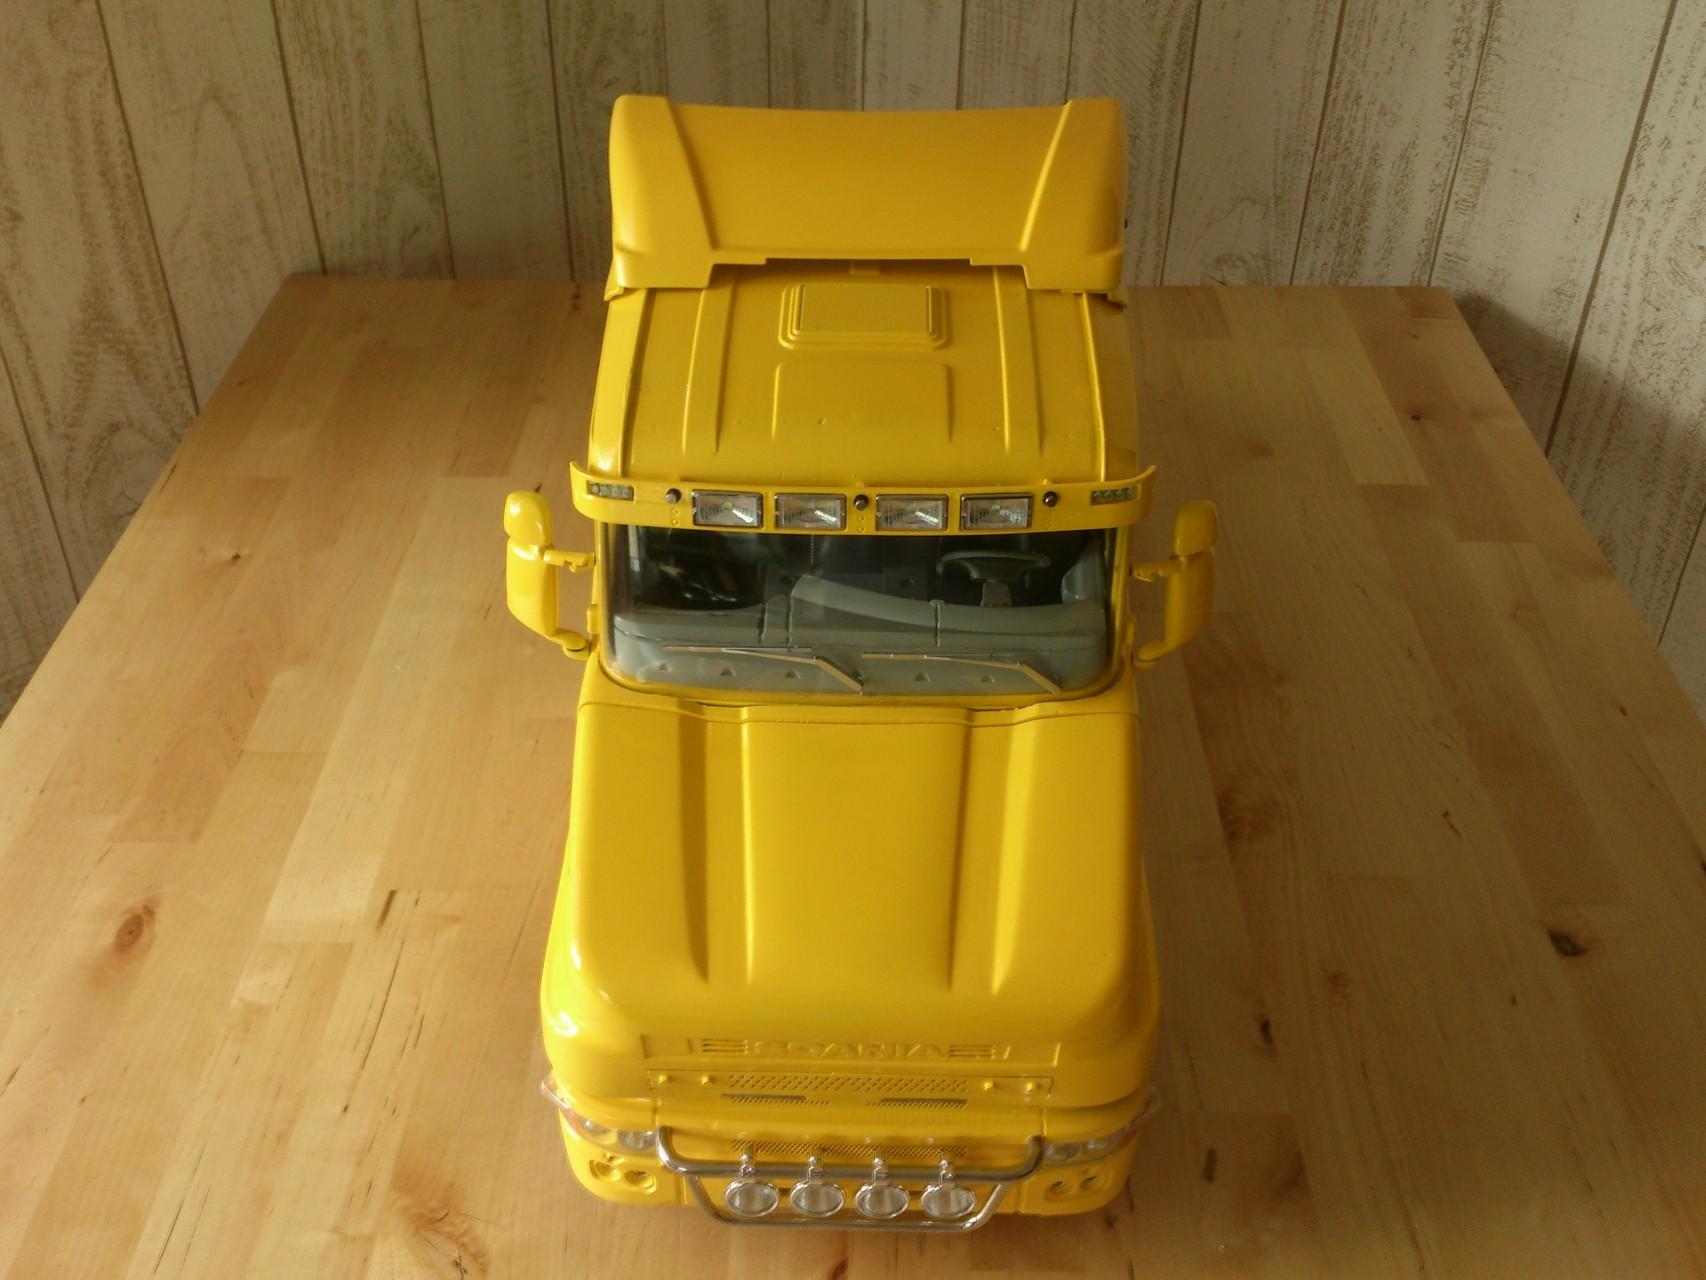 Scania CT19の前部